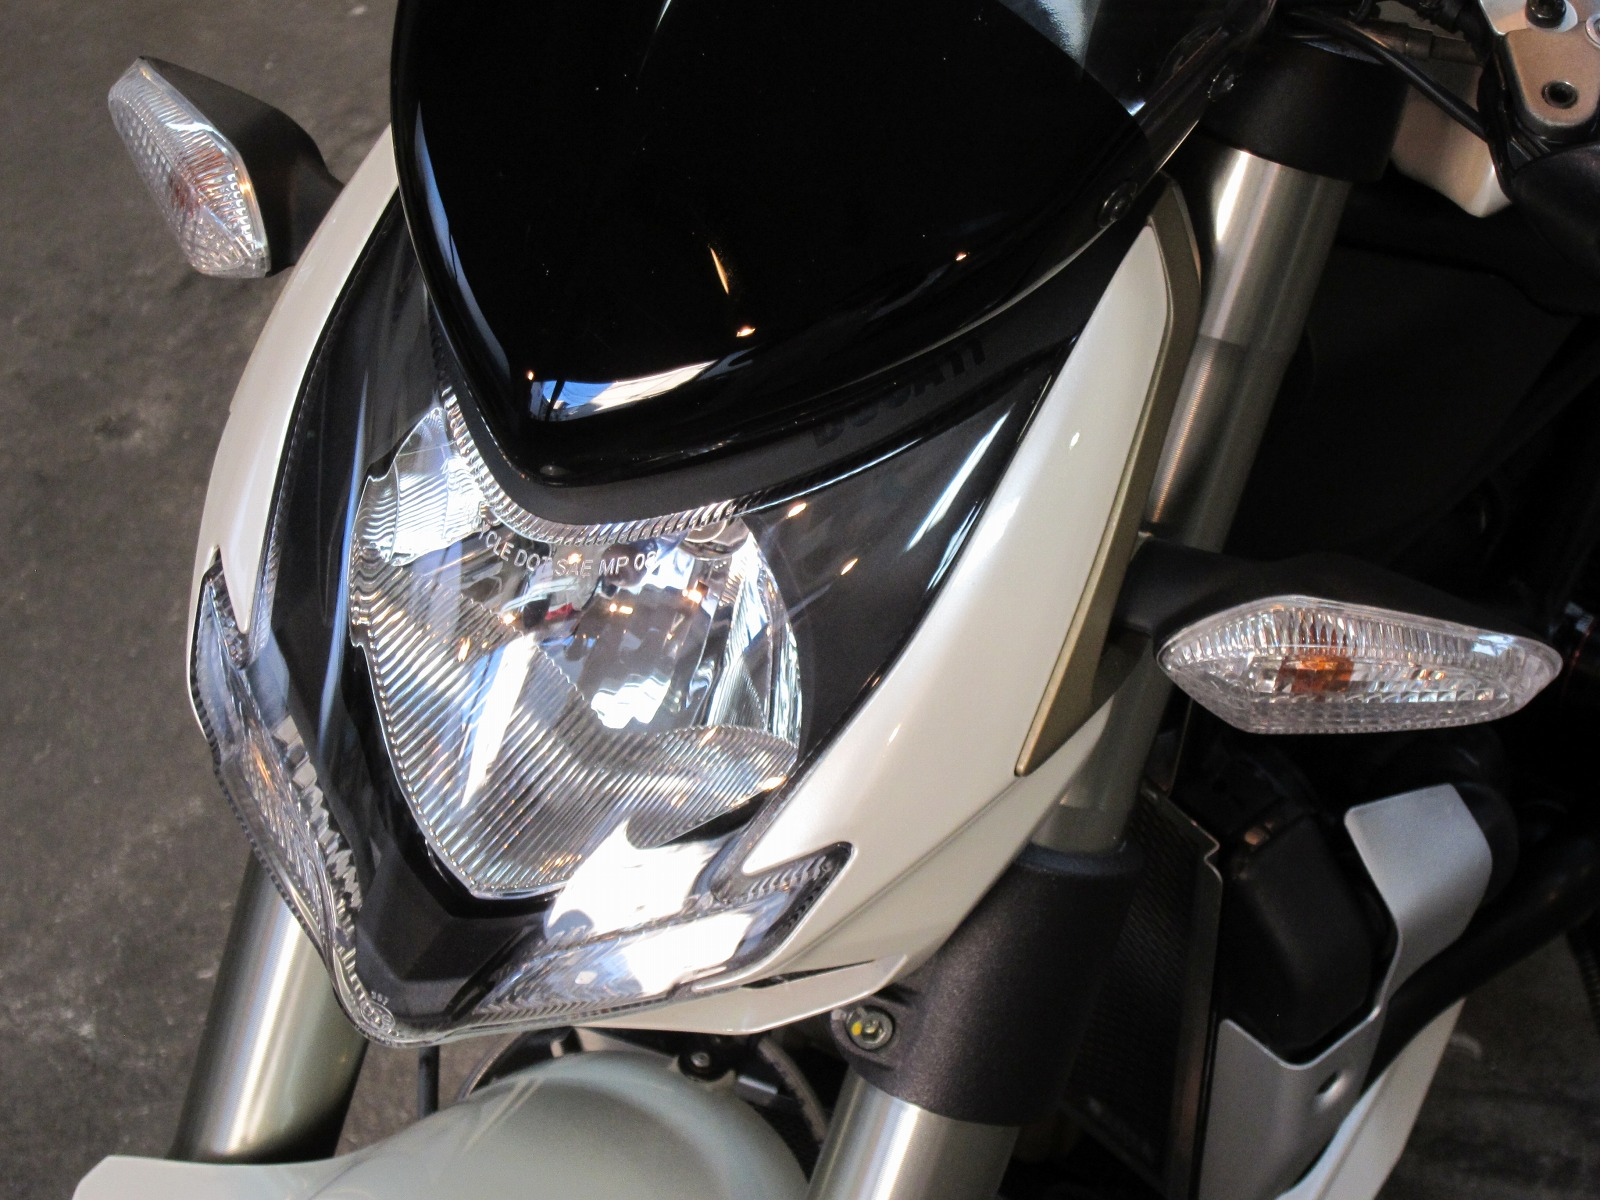 20130221-ducati-streetfighter-12